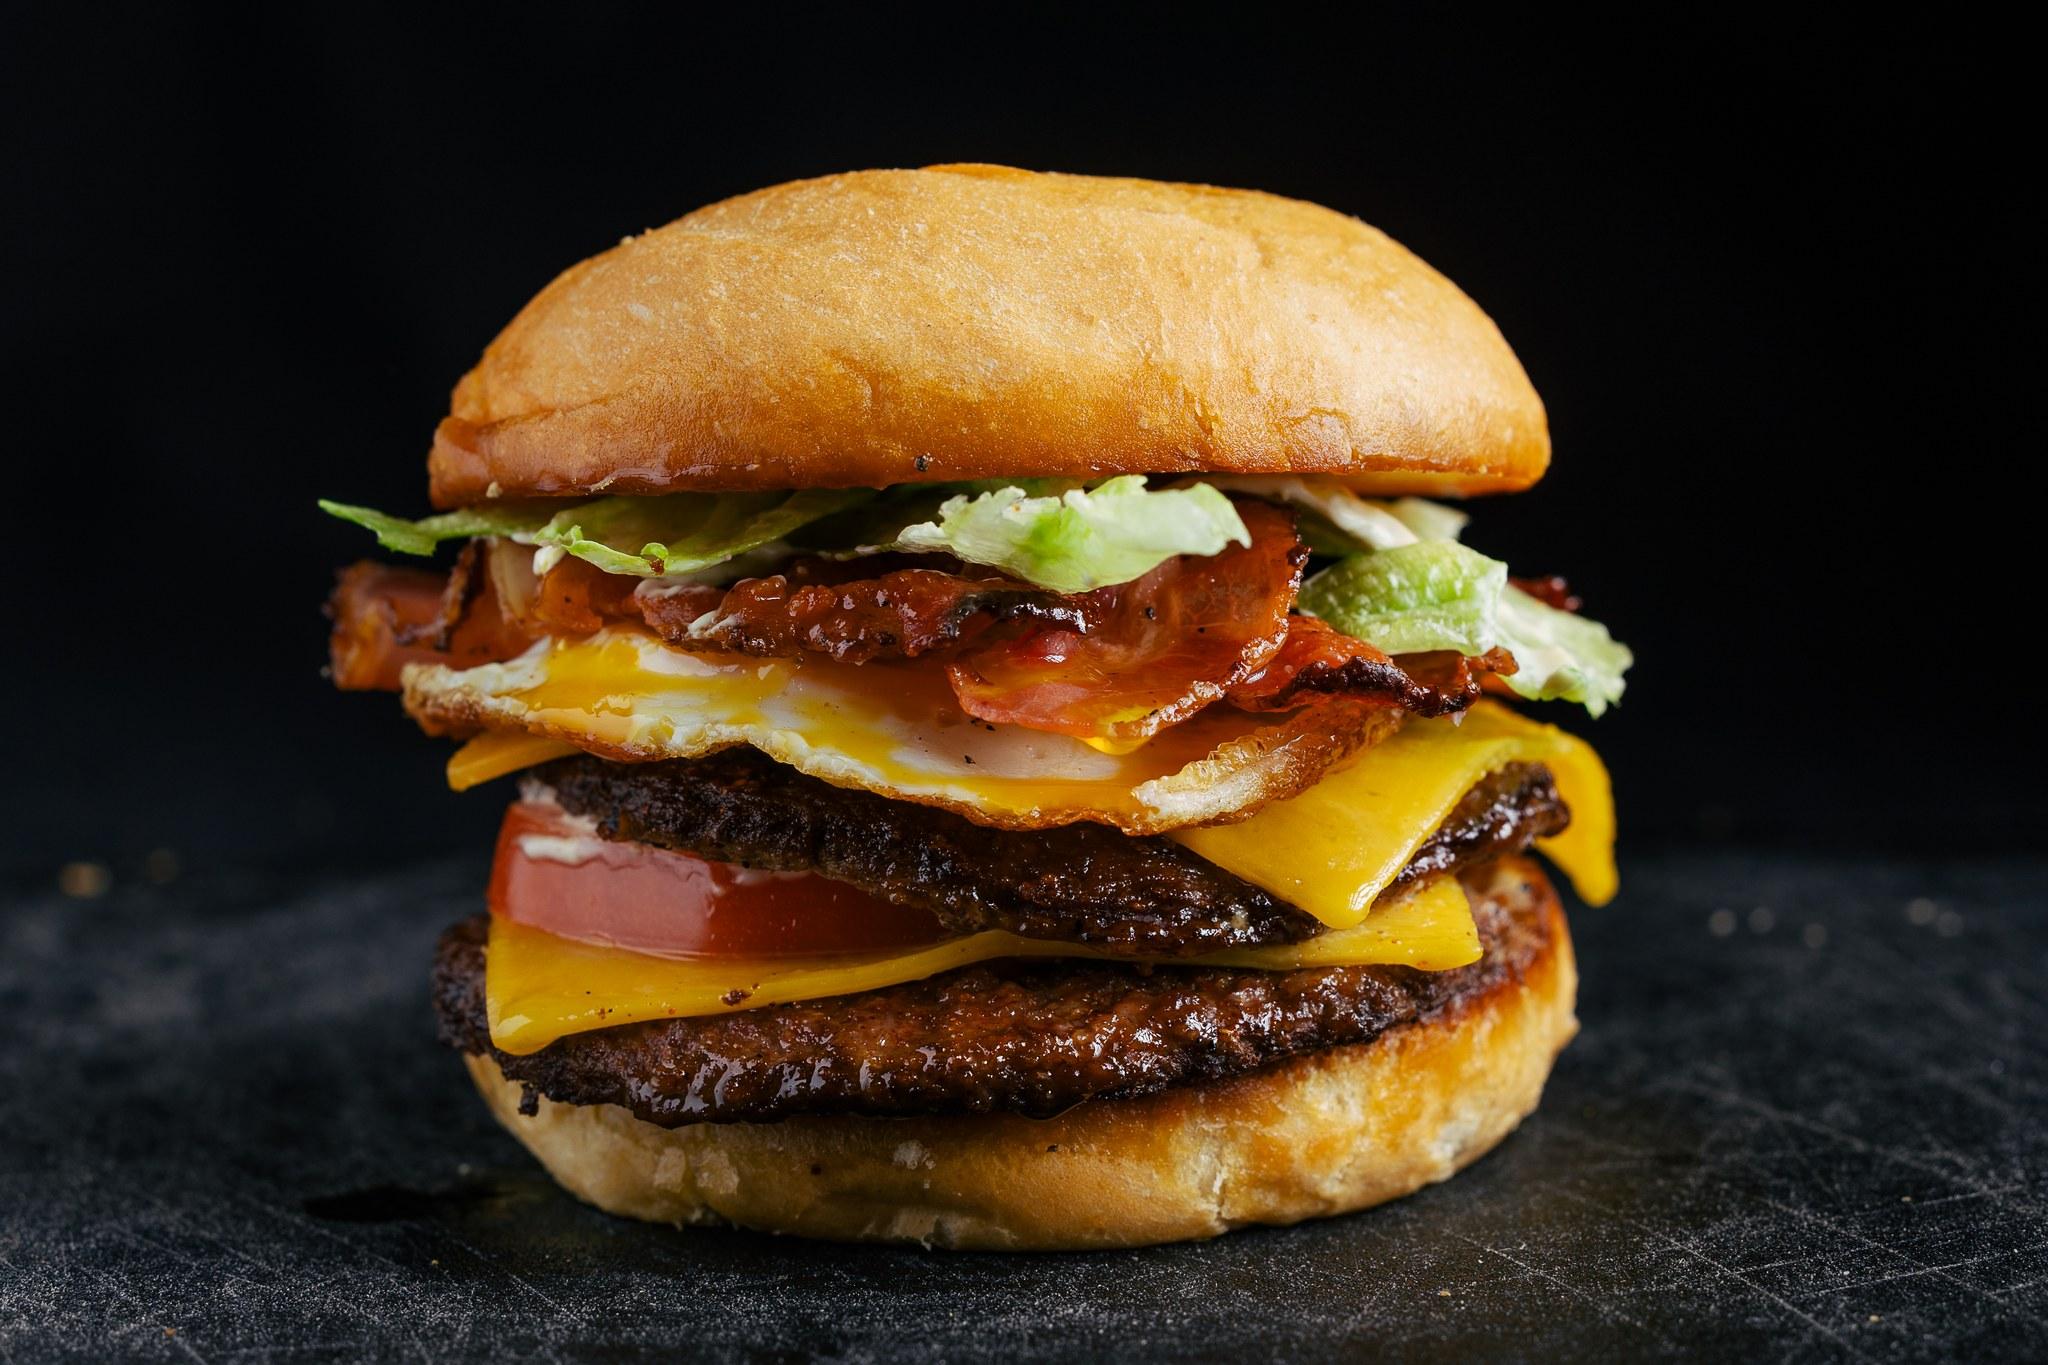 Parhaat burgerit